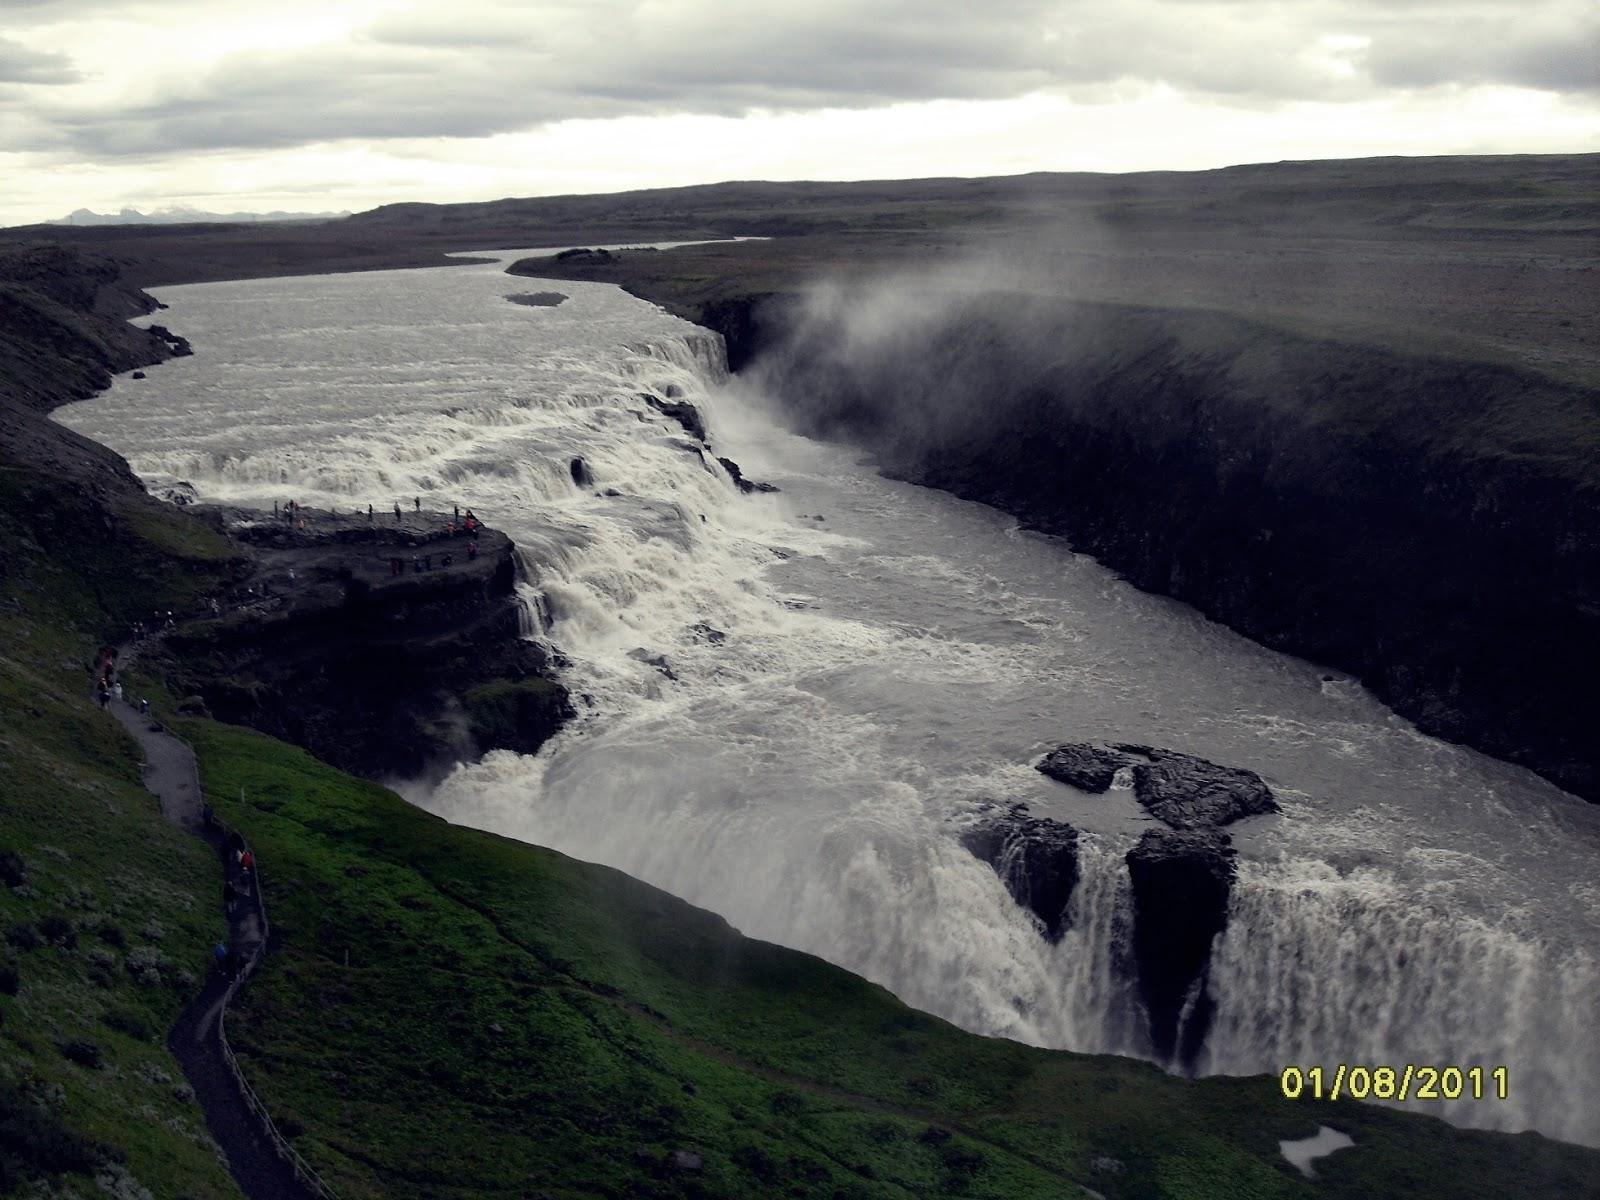 wodospad Gullfoss, Gullfoss, wodospad w Islandii, islandzki wodospad, golden circle